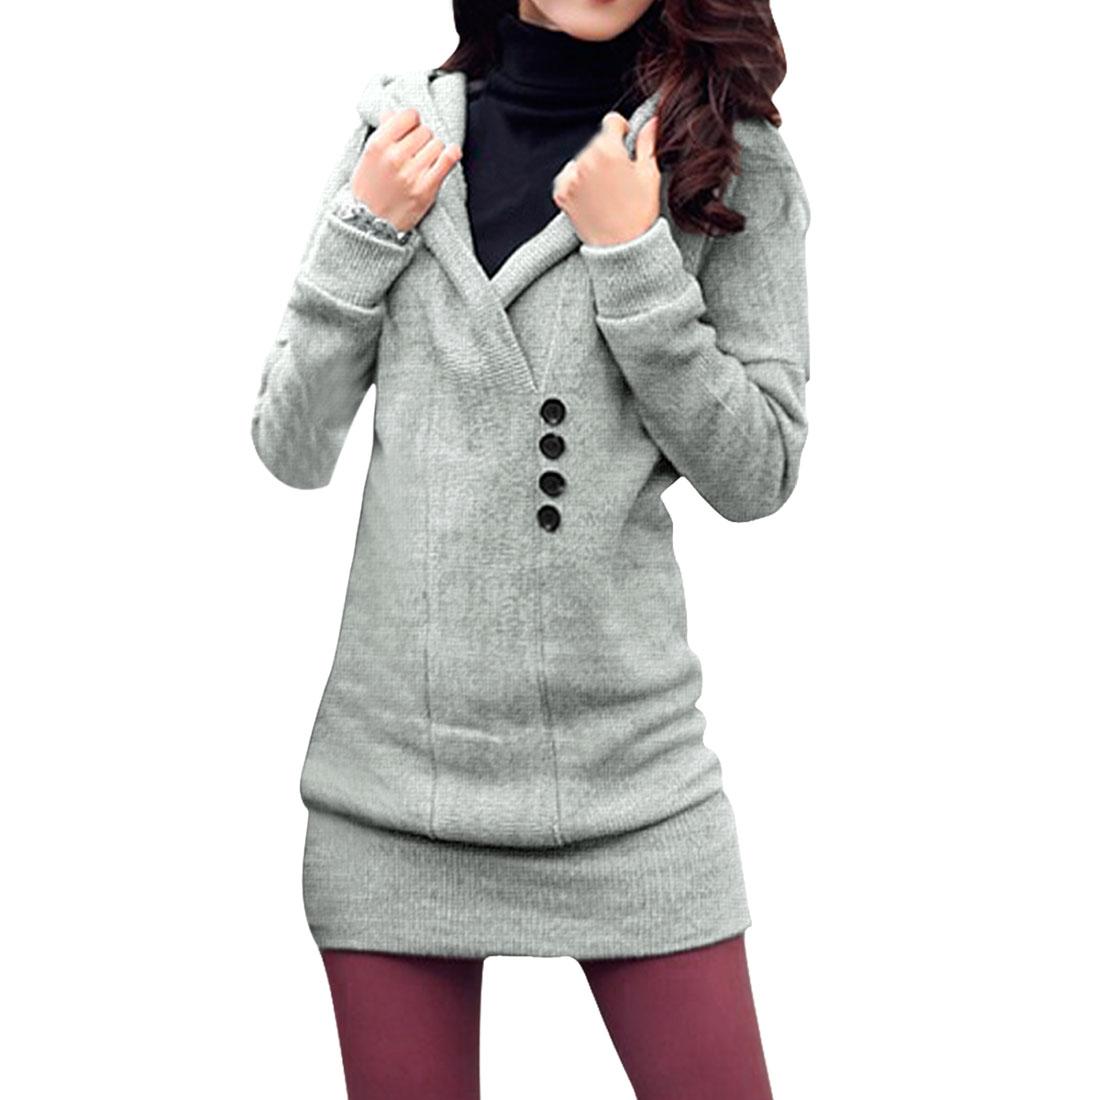 Allegra K Women's Hooded Pullover Button Decor Tunic Knit Shirt Gray (Size XL / 16)